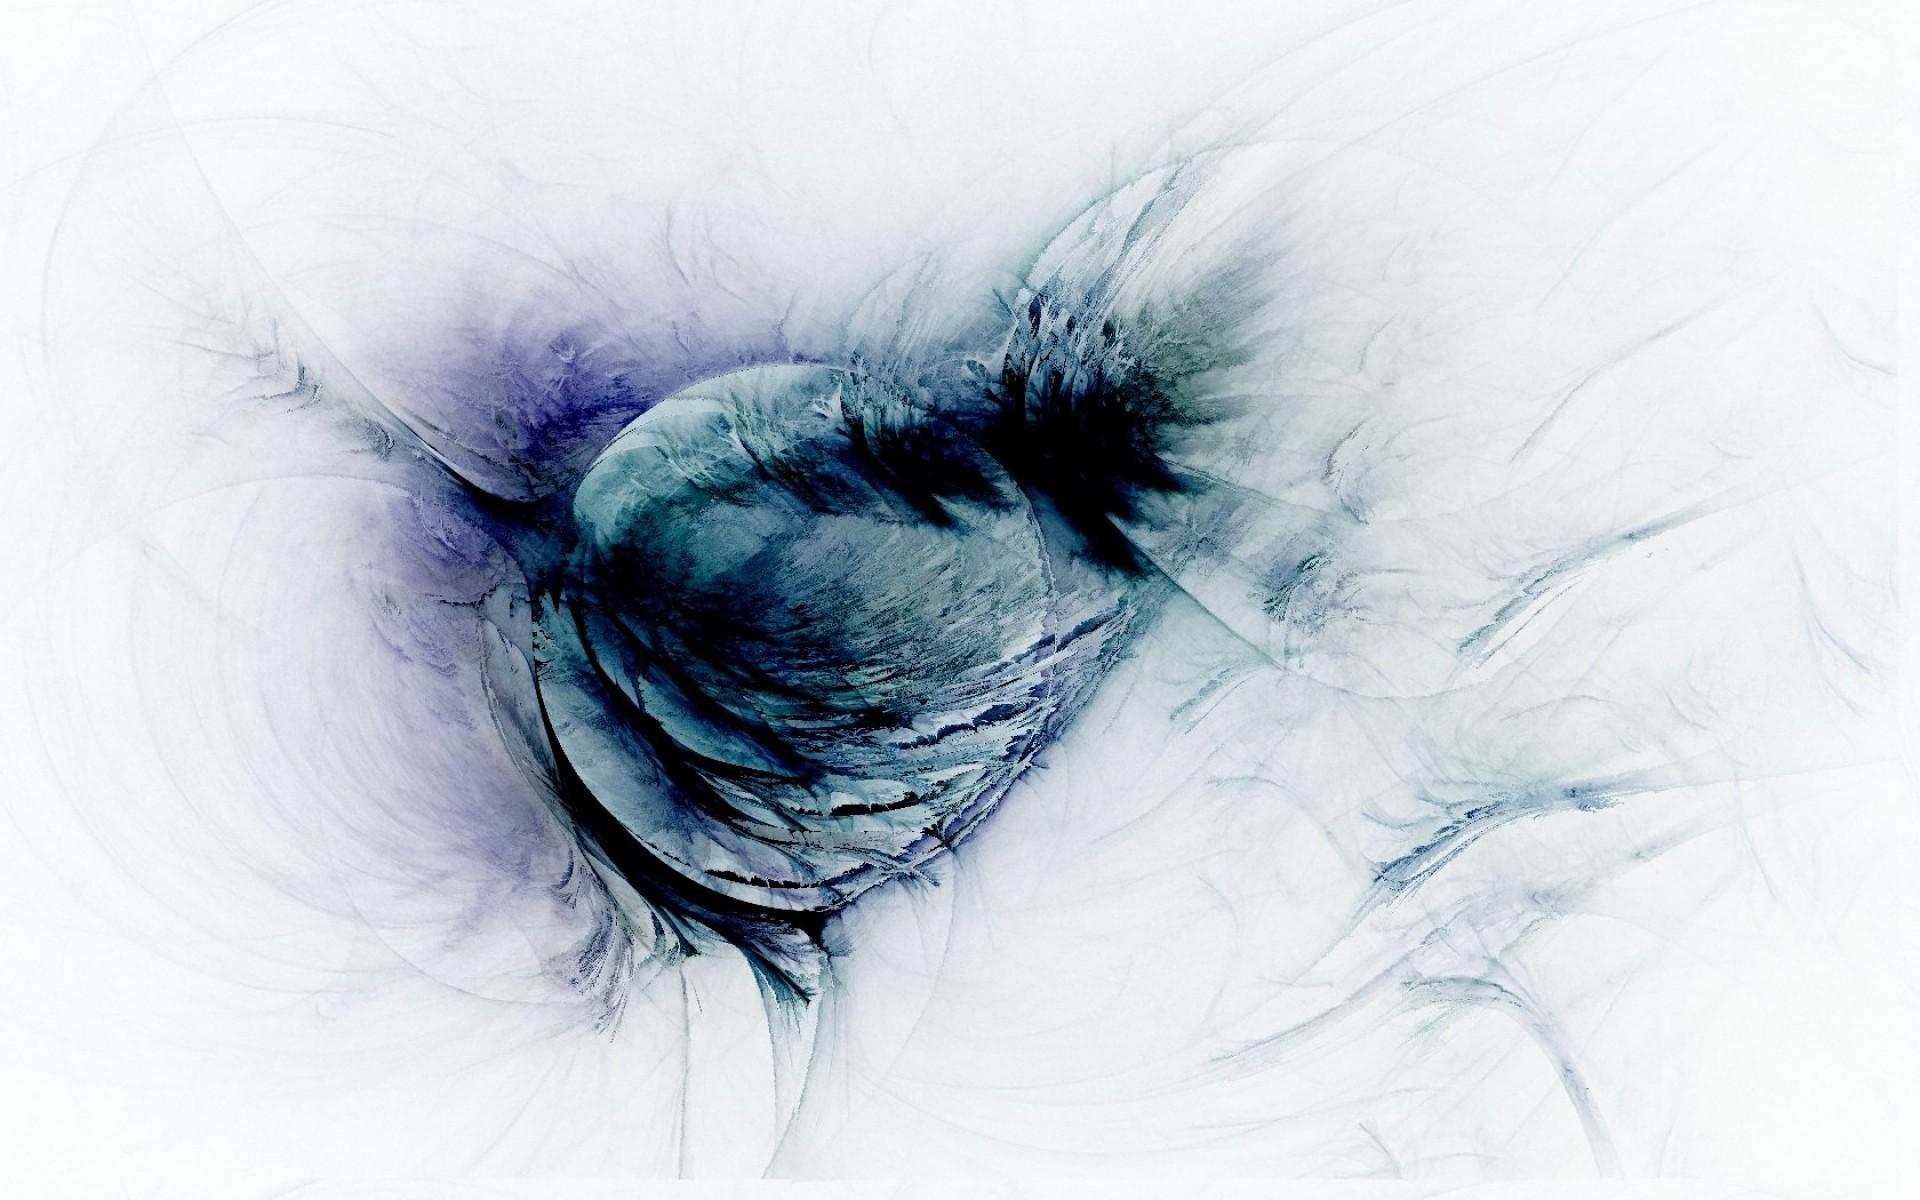 Wallpaper Gambar Putih Ilustrasi Bulu Biru Burung Mata